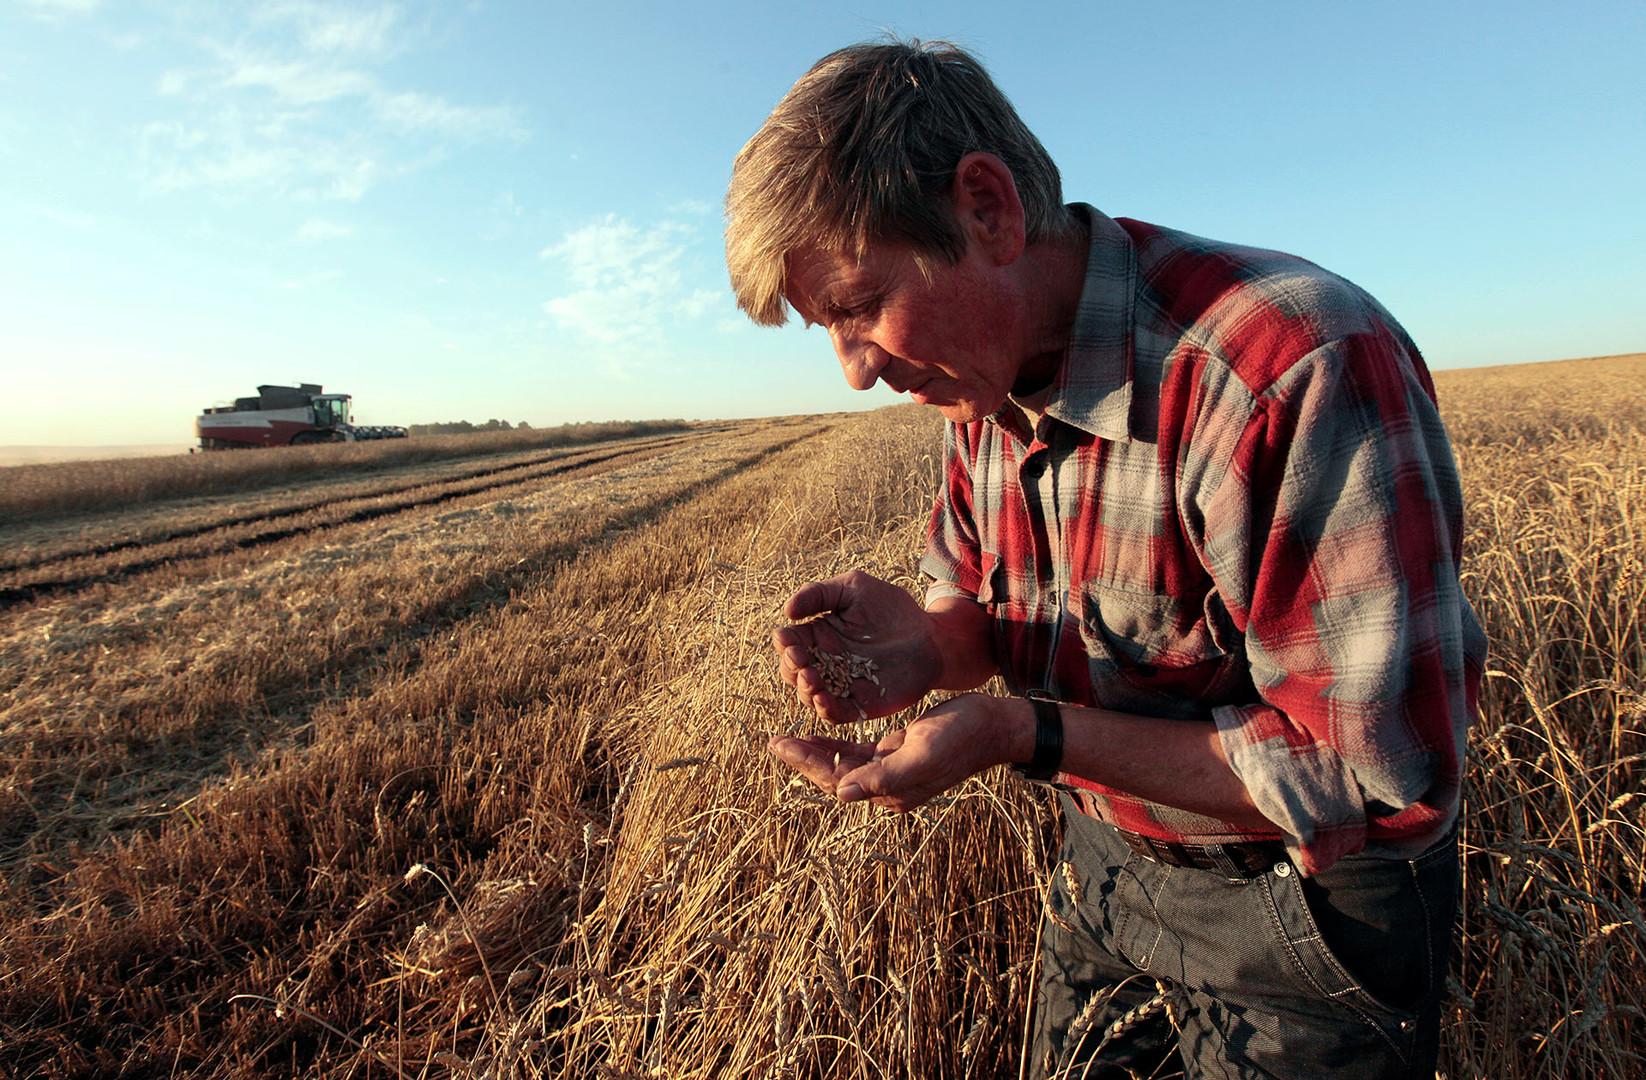 Delavec pregleduje pšenico na polju kmetije Svetlolobovskoje ob robu istoimenske vasi, približno 390 km južno od Krasnojarska.